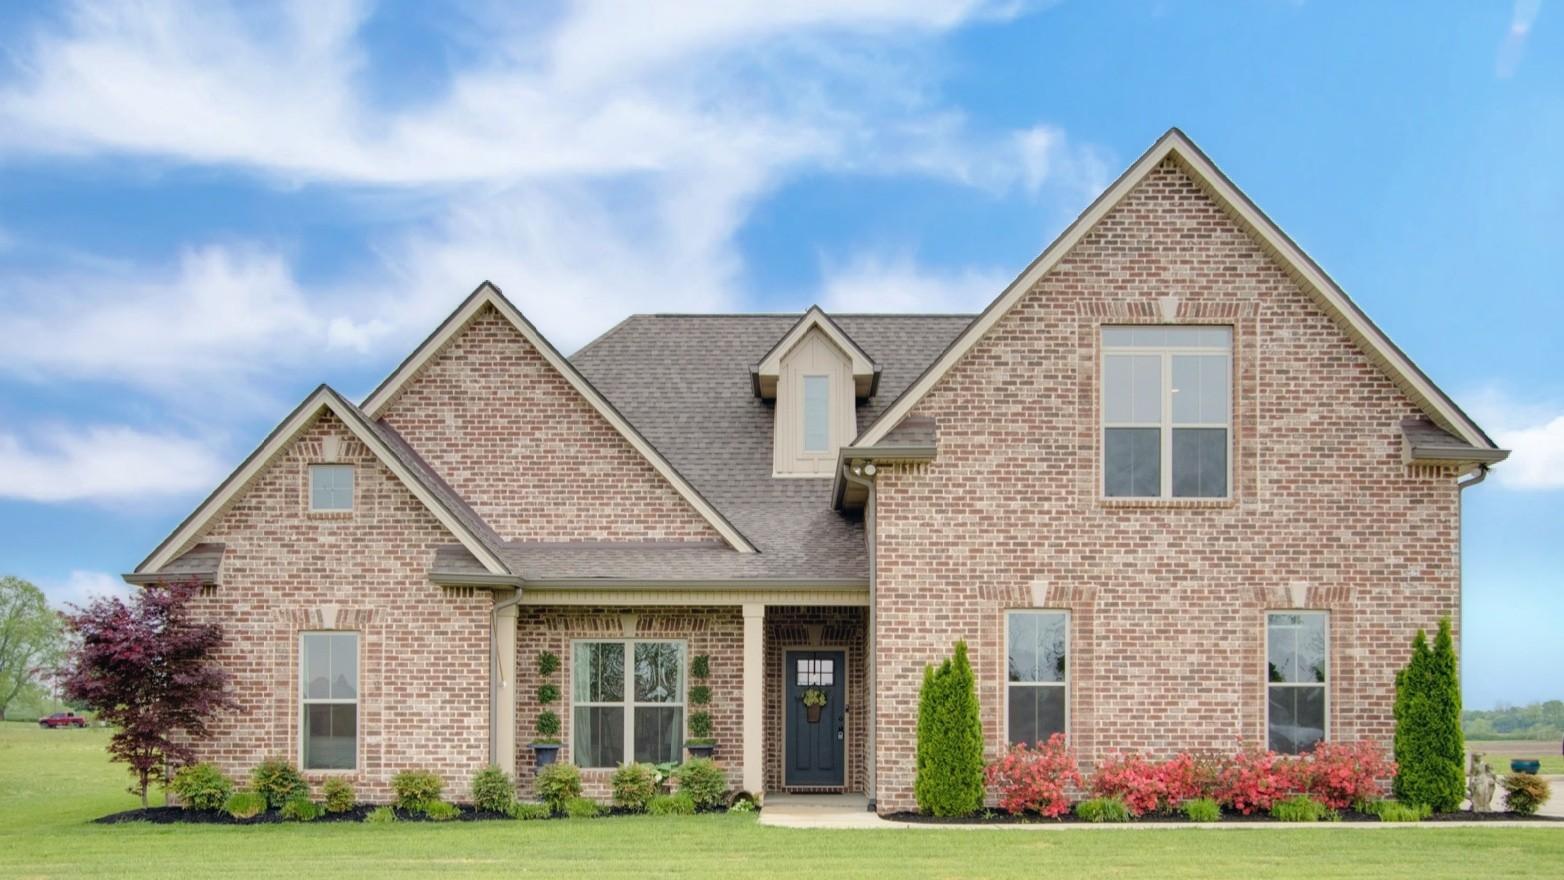 1714 Hickory Ridge Rd Property Photo - Lebanon, TN real estate listing